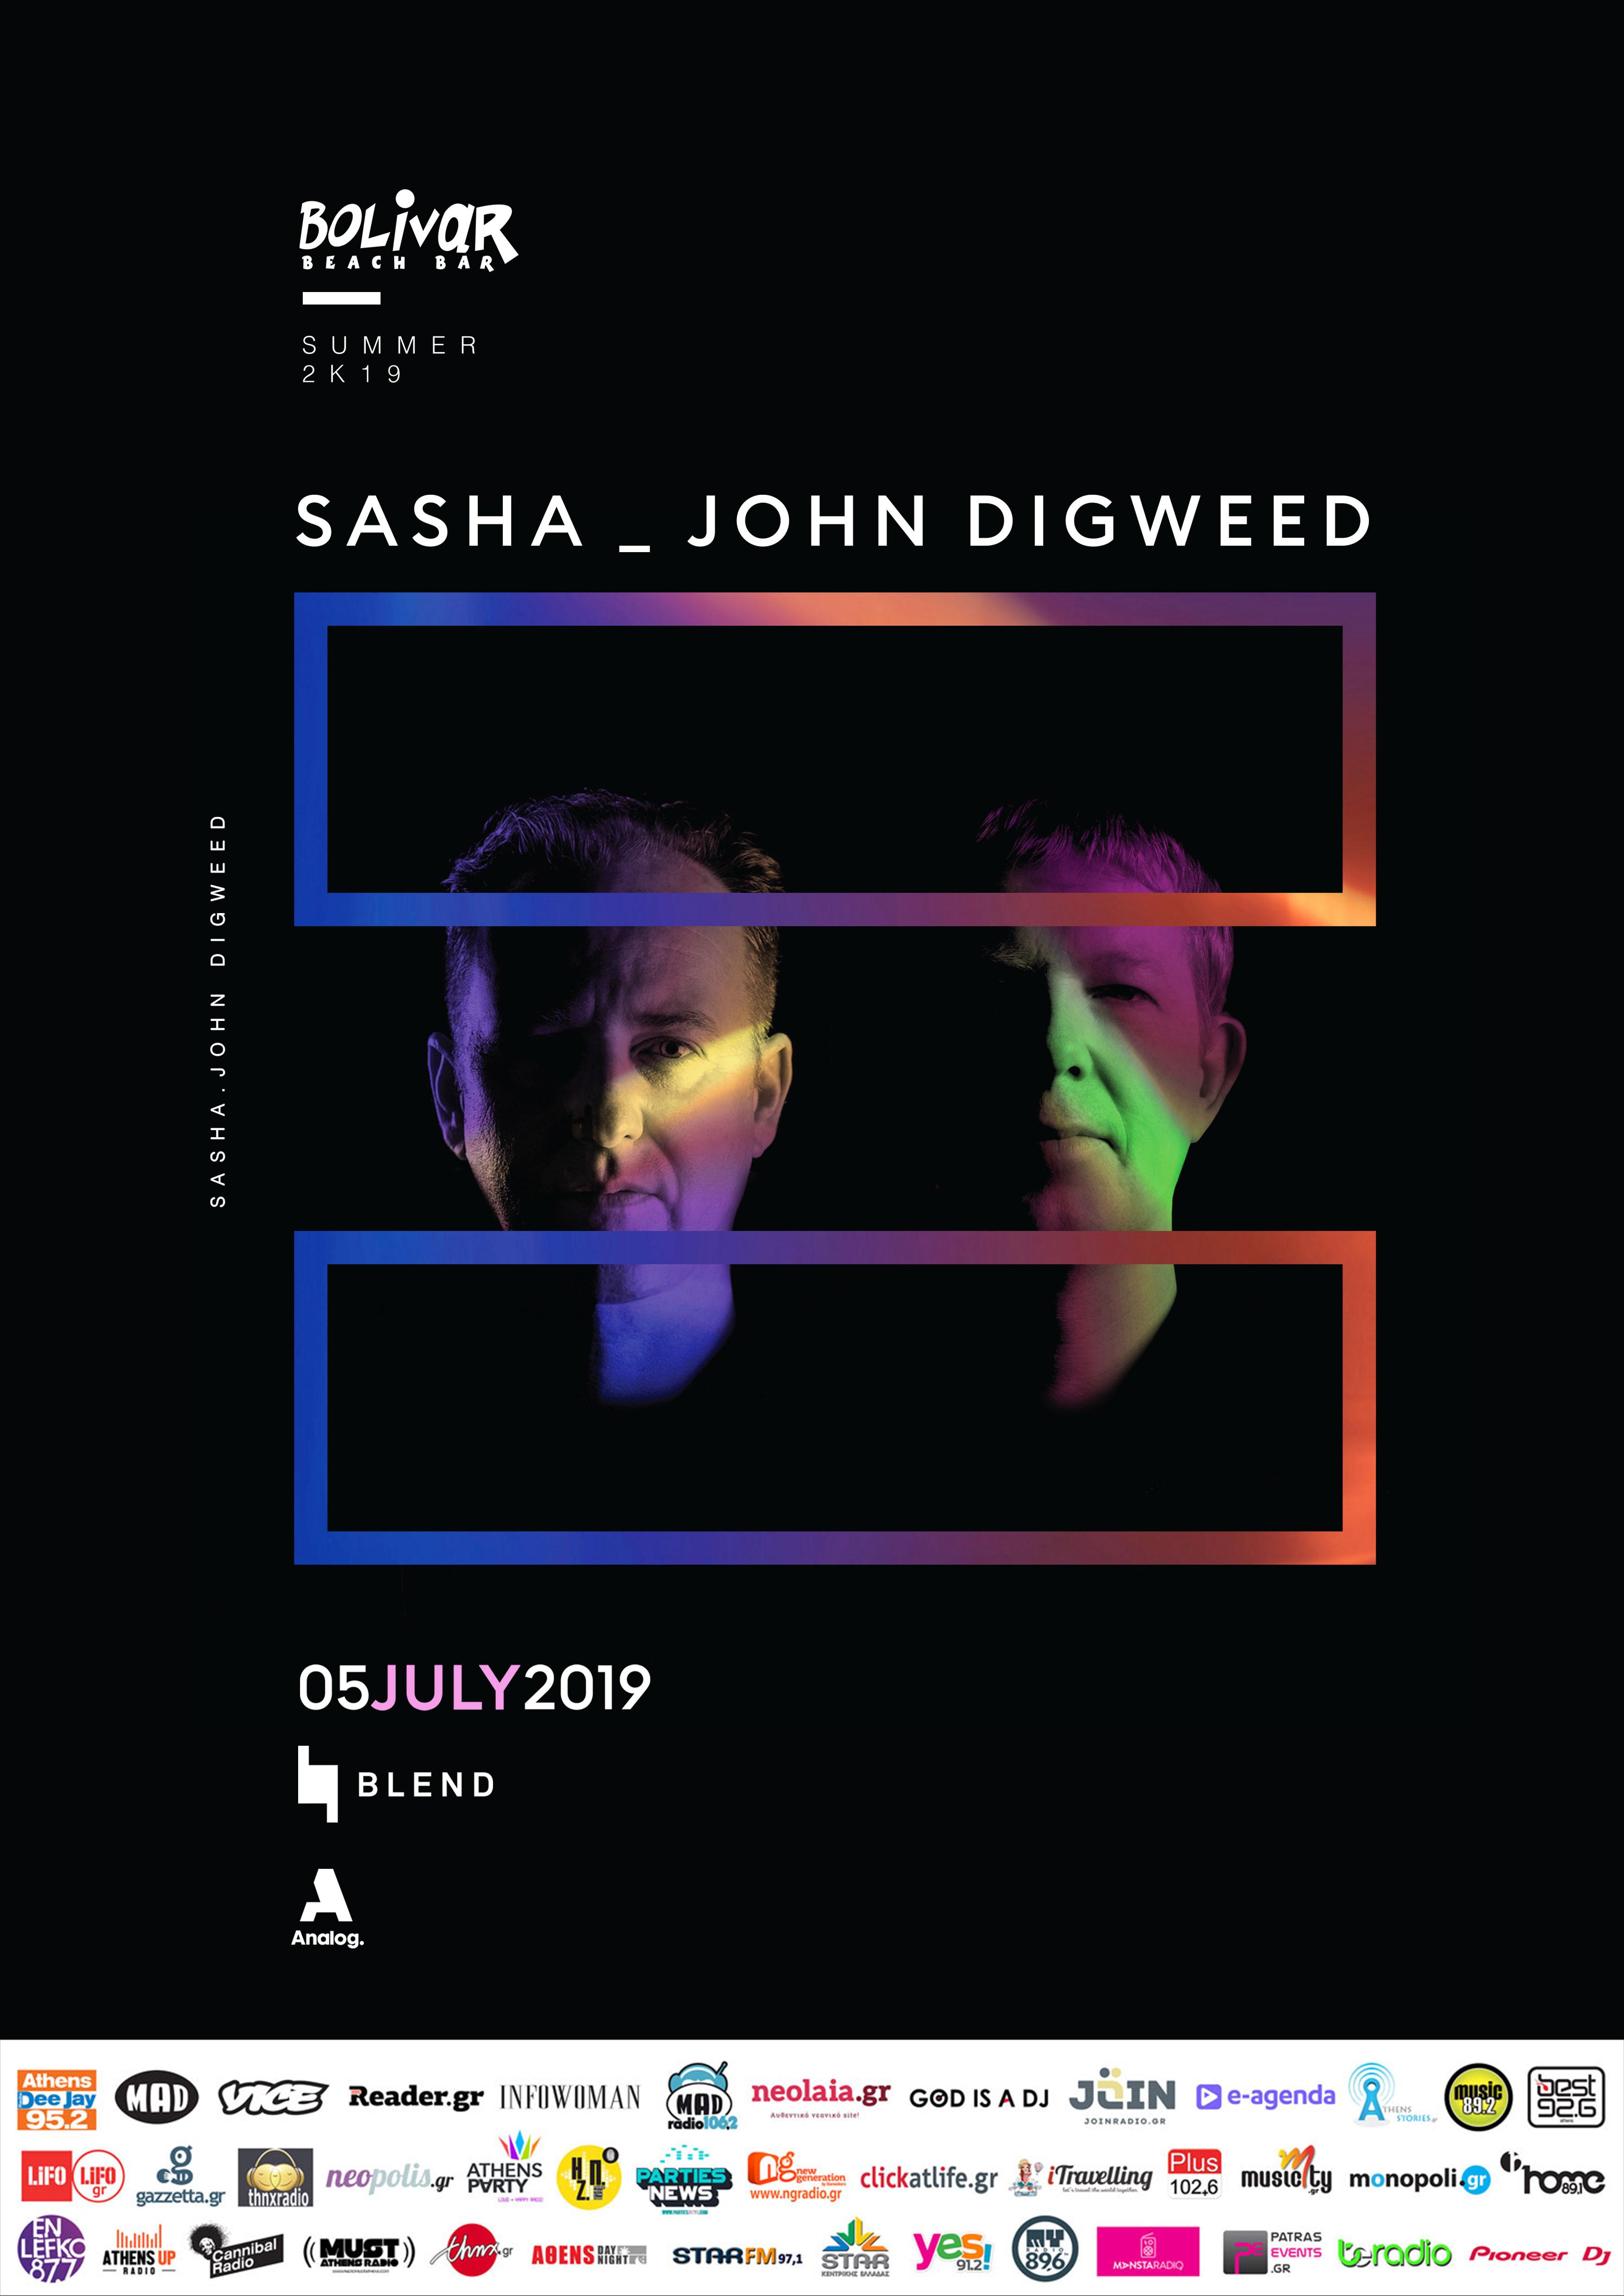 Sasha - Digweed Poster